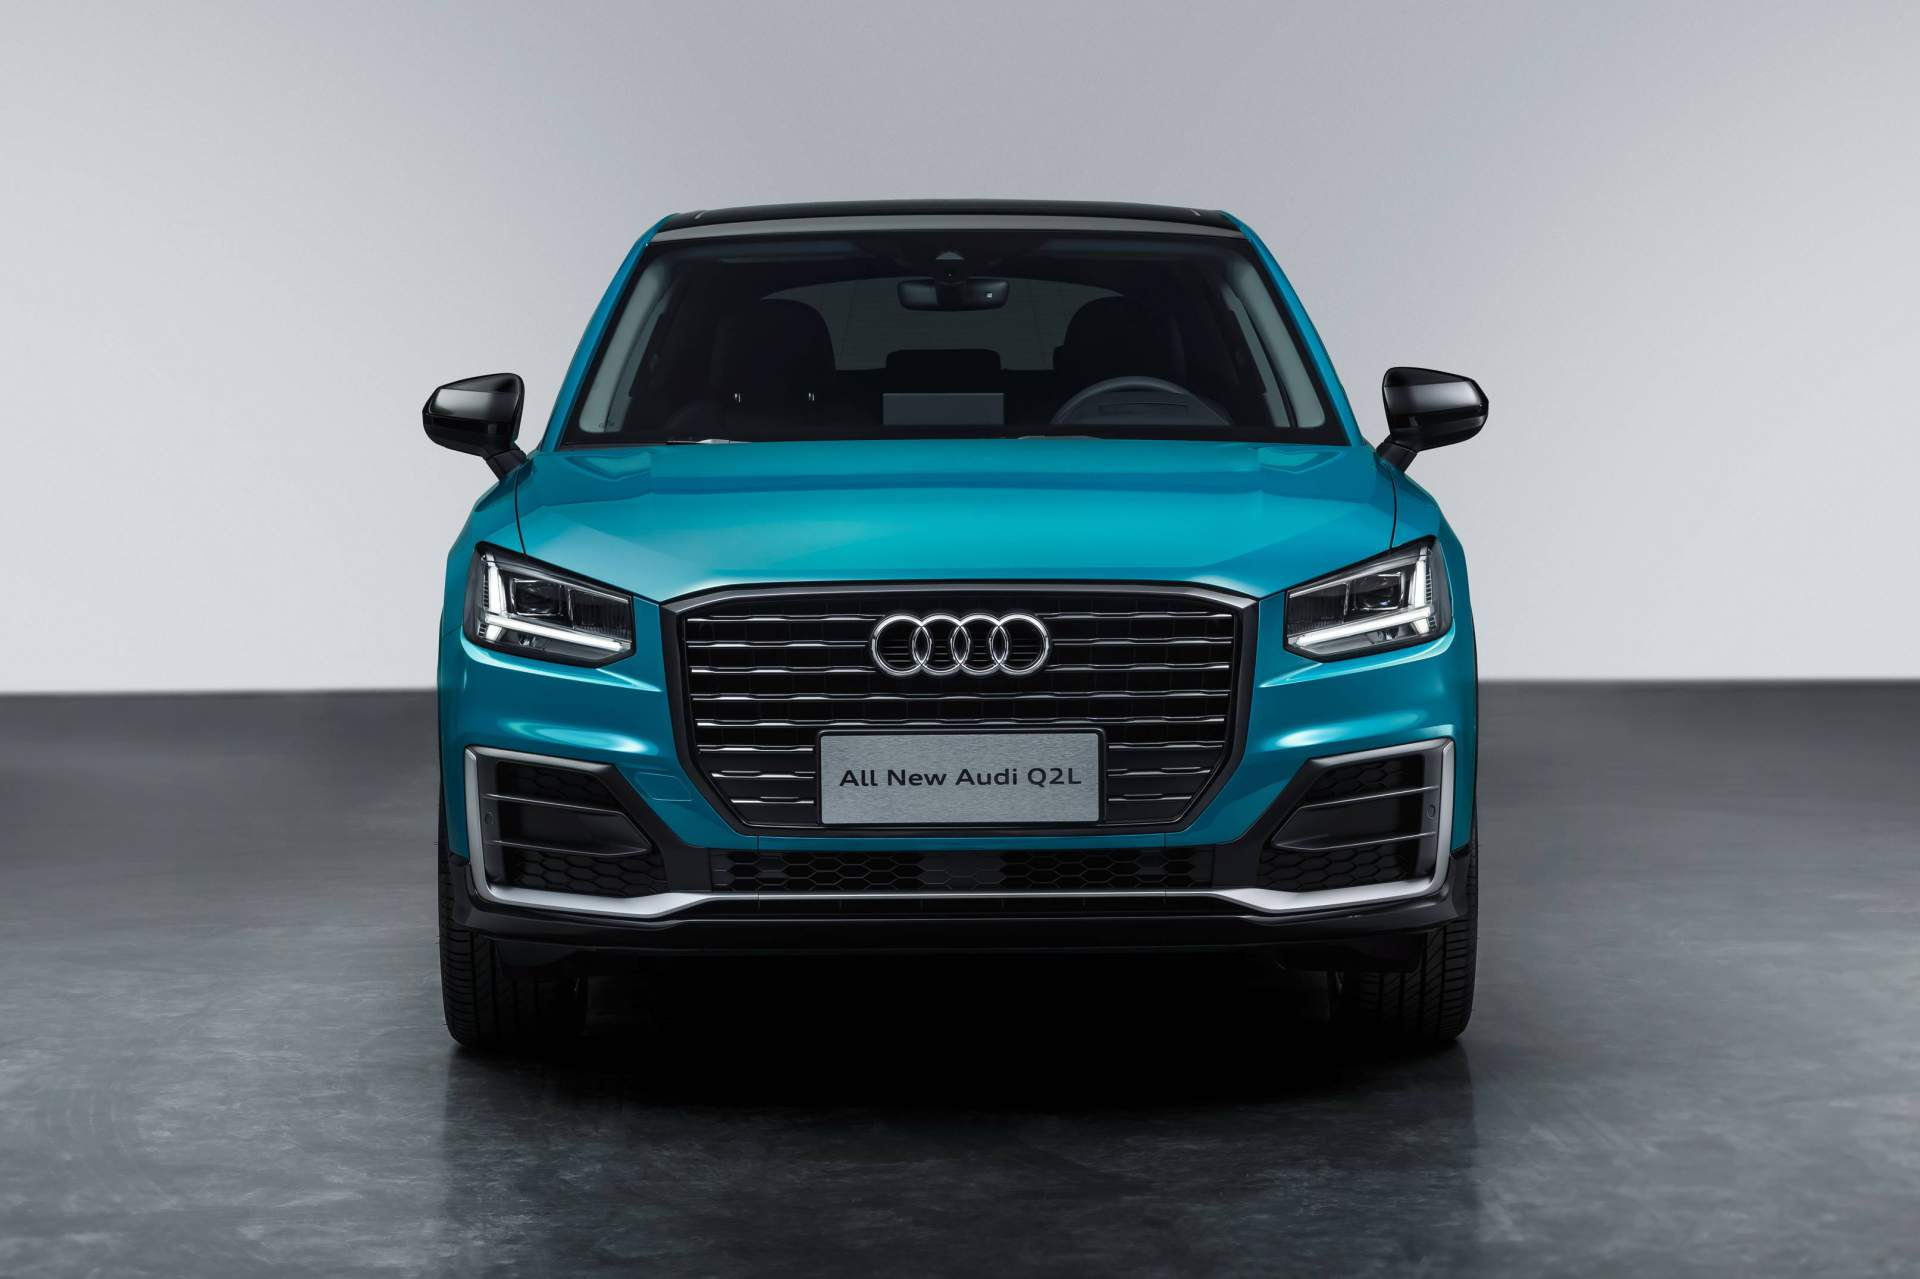 Audi_Q2_L_0052